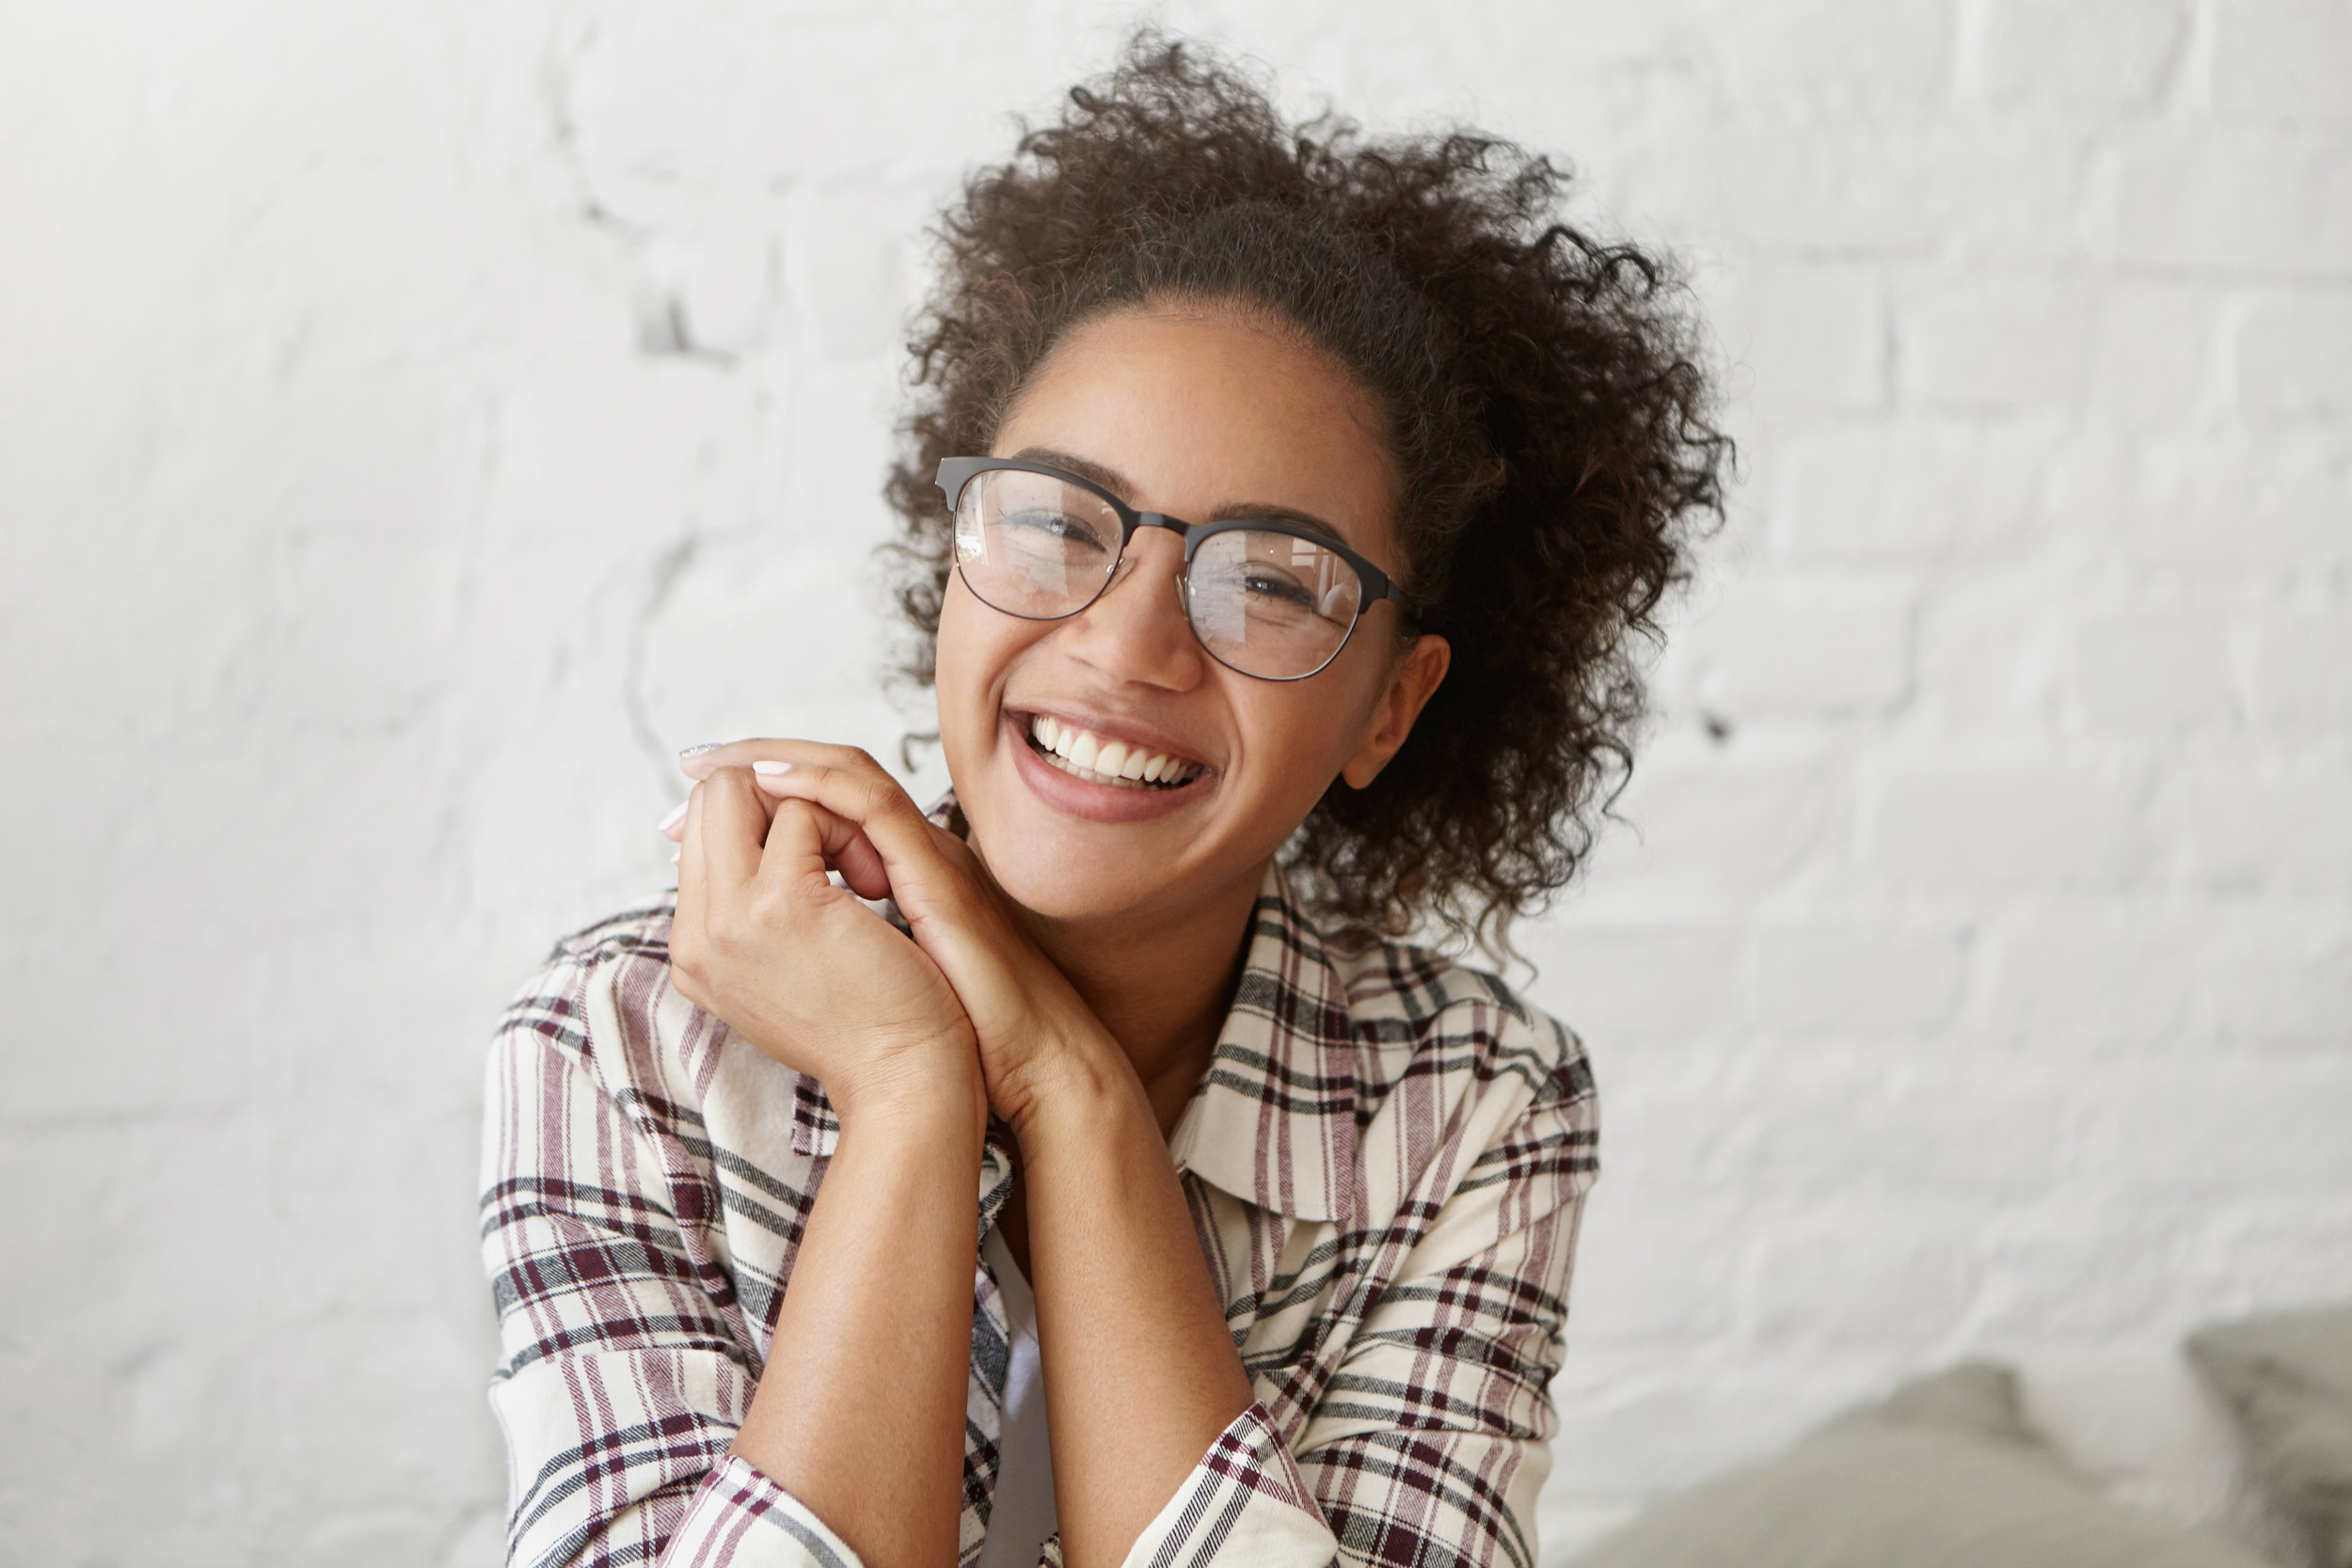 smiling woman.jpg